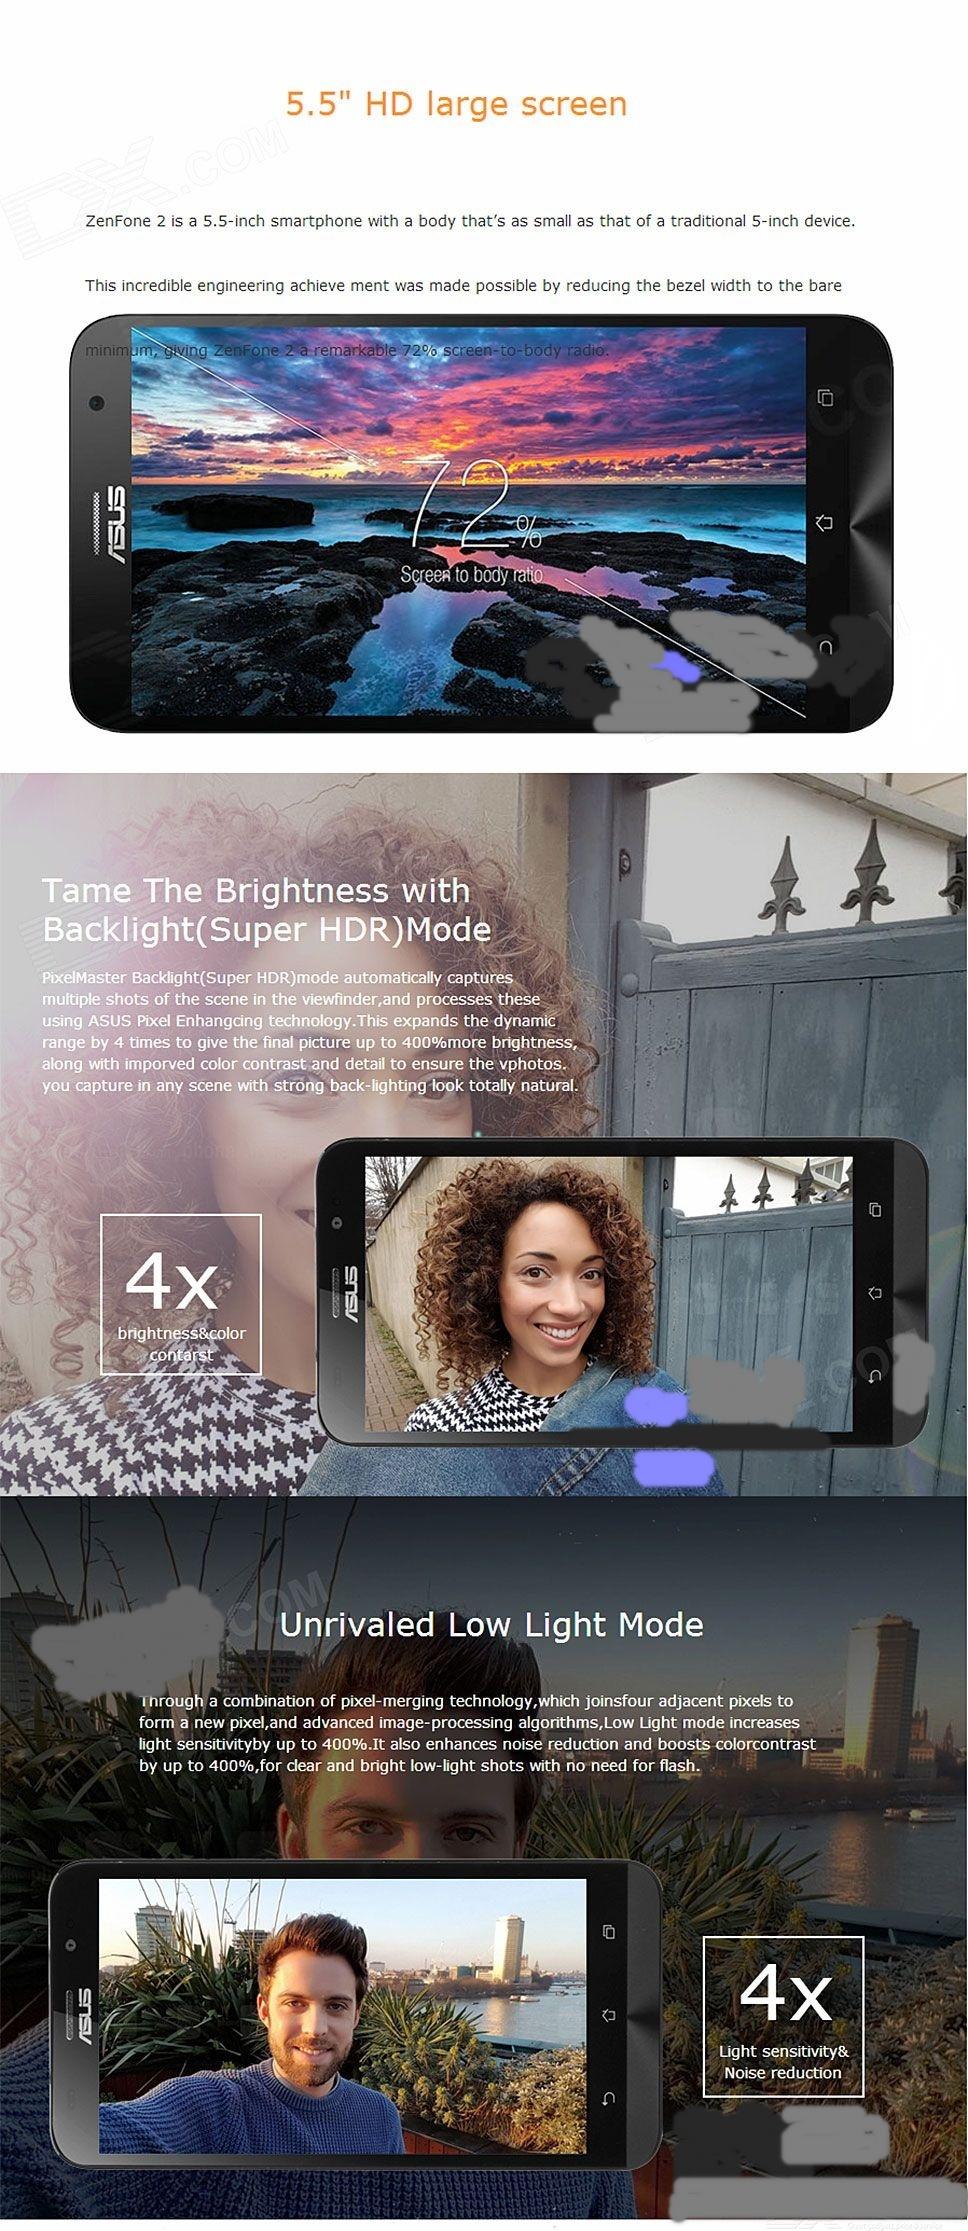 i.ibb.co/YbWCjw9/Smartphone-Android-5-0-4-GB-RAM-32-GB-ROM-Quad-Core-4-G-ASUS-Zenfone-2-ZE551-ML-2.jpg